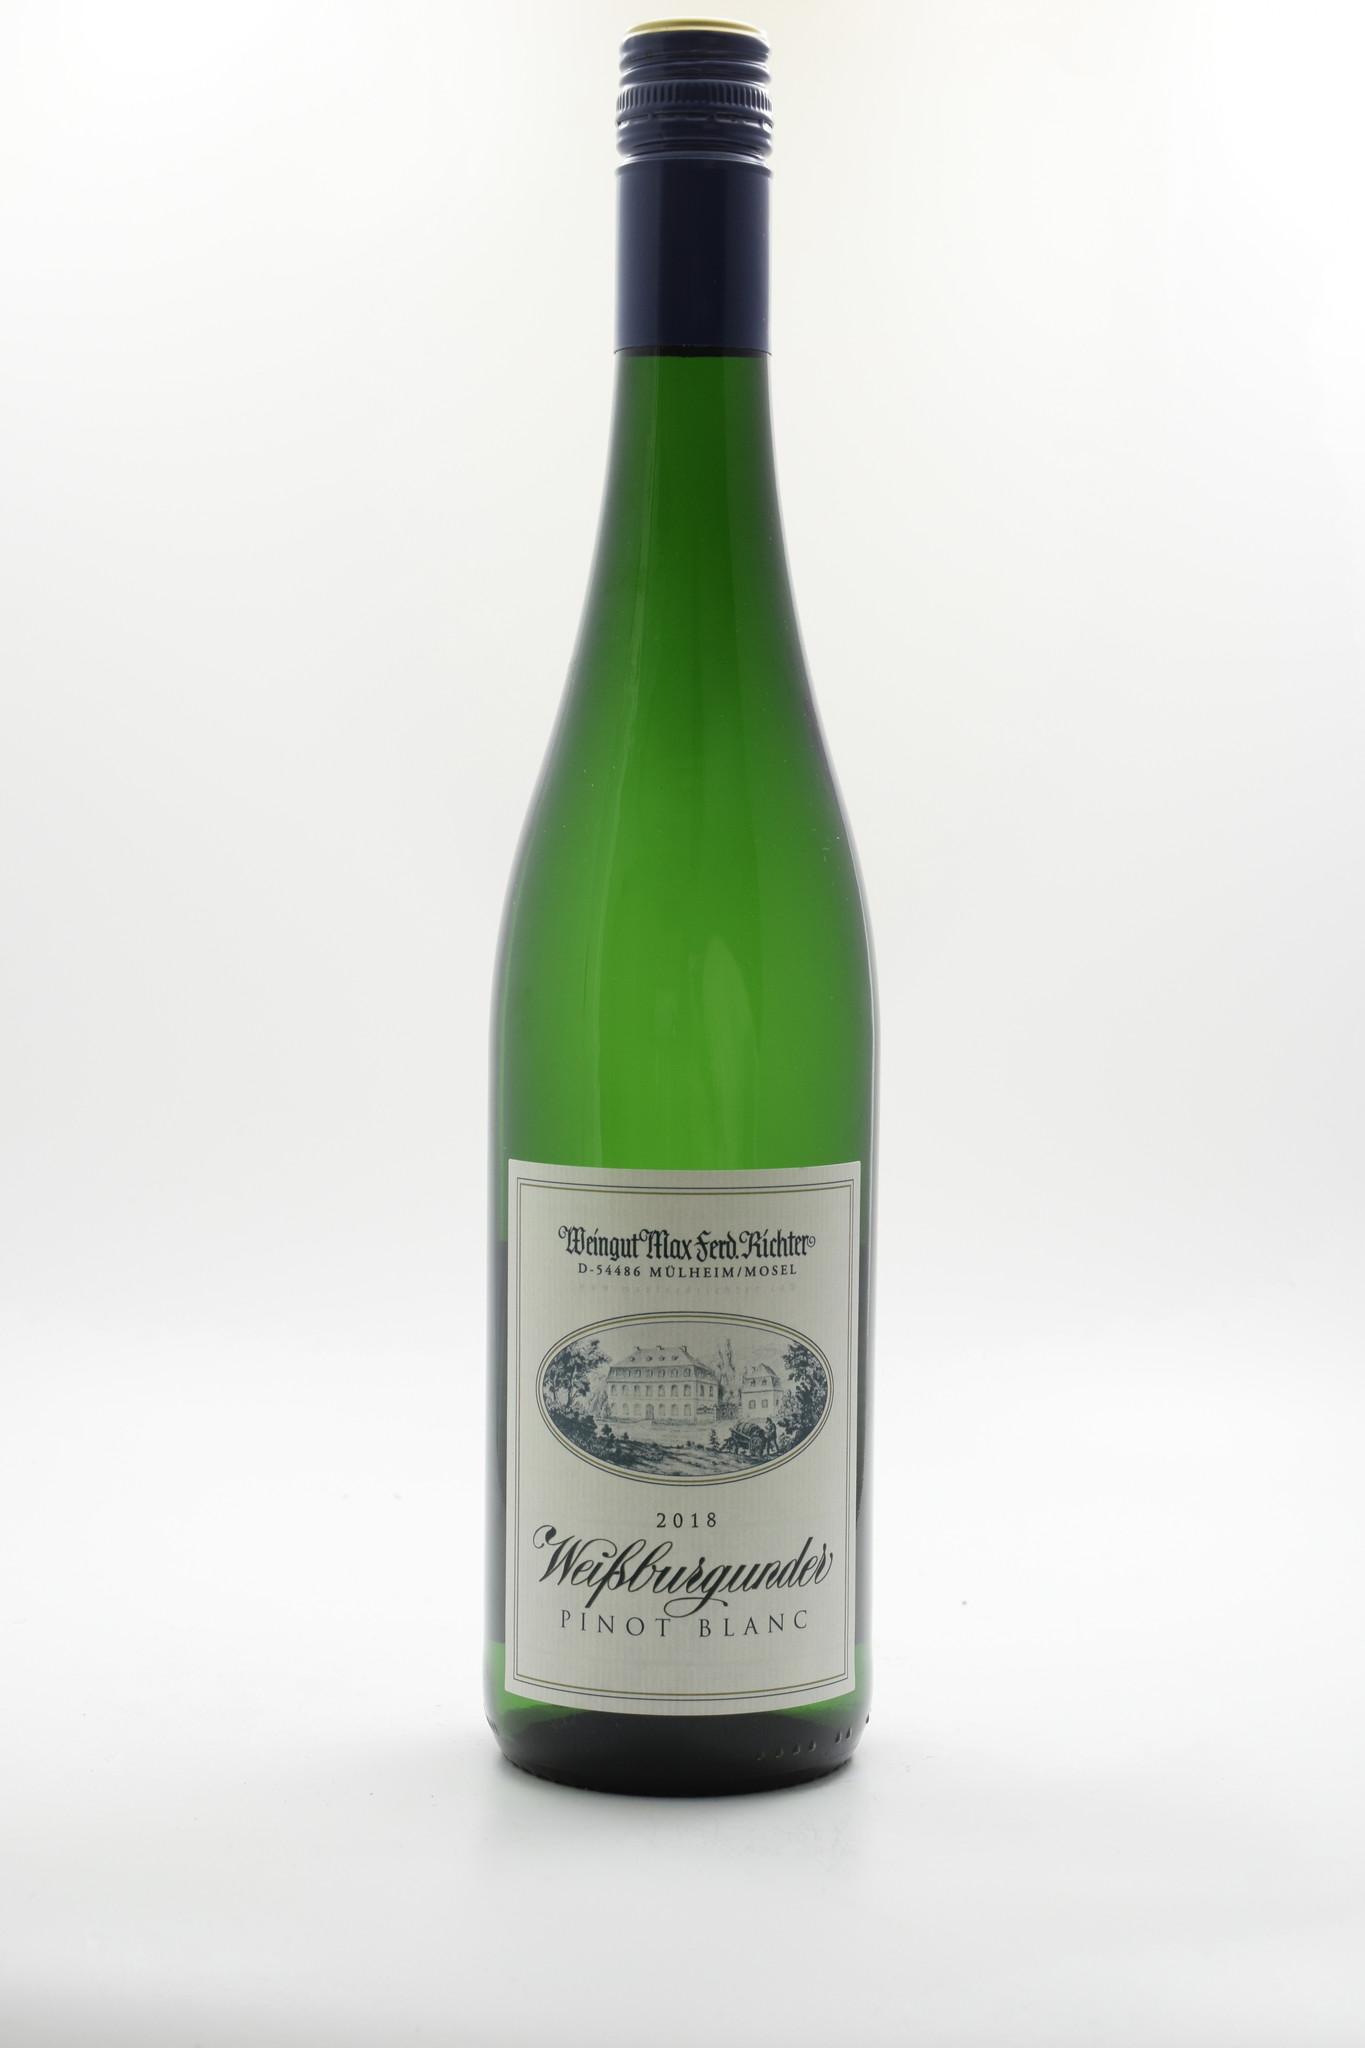 Weißburgunder Pinot Blanc-1